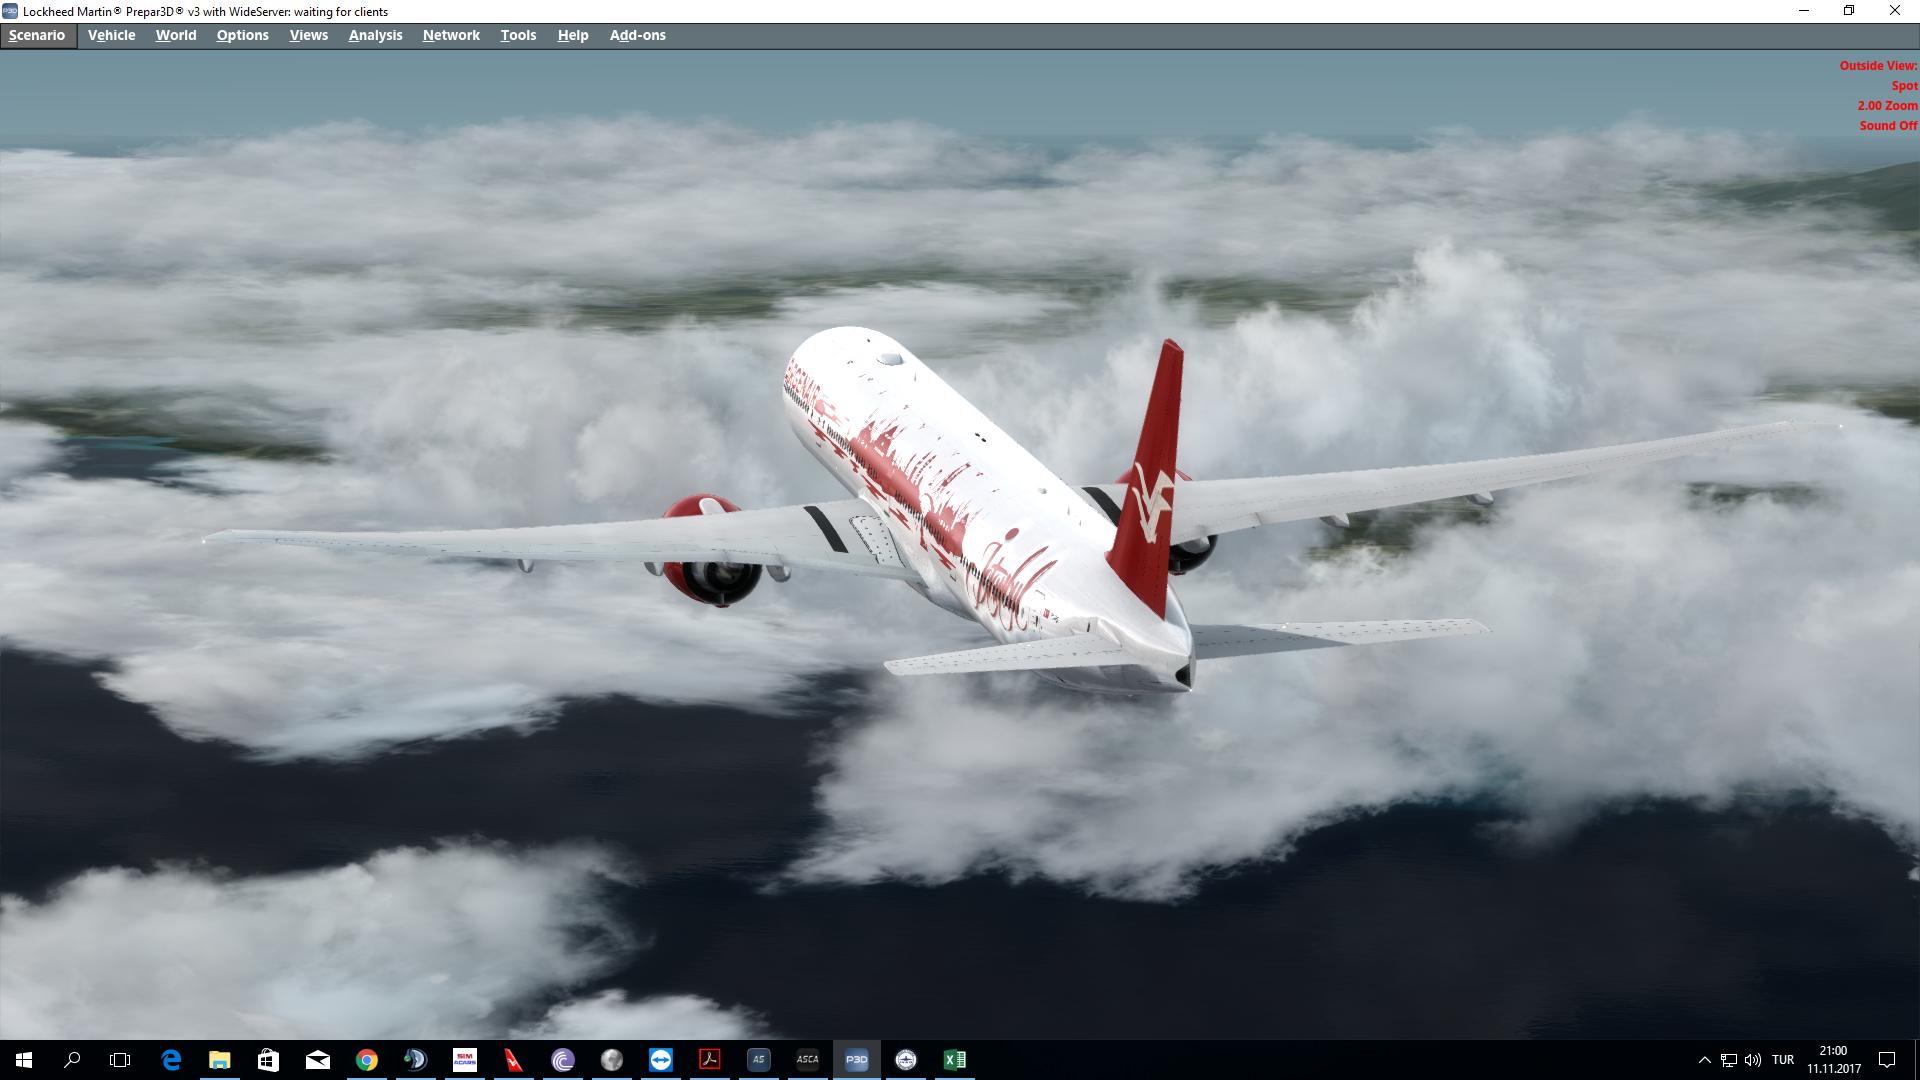 Desktop Screenshot 2017.11.11 - 21.00.24.15